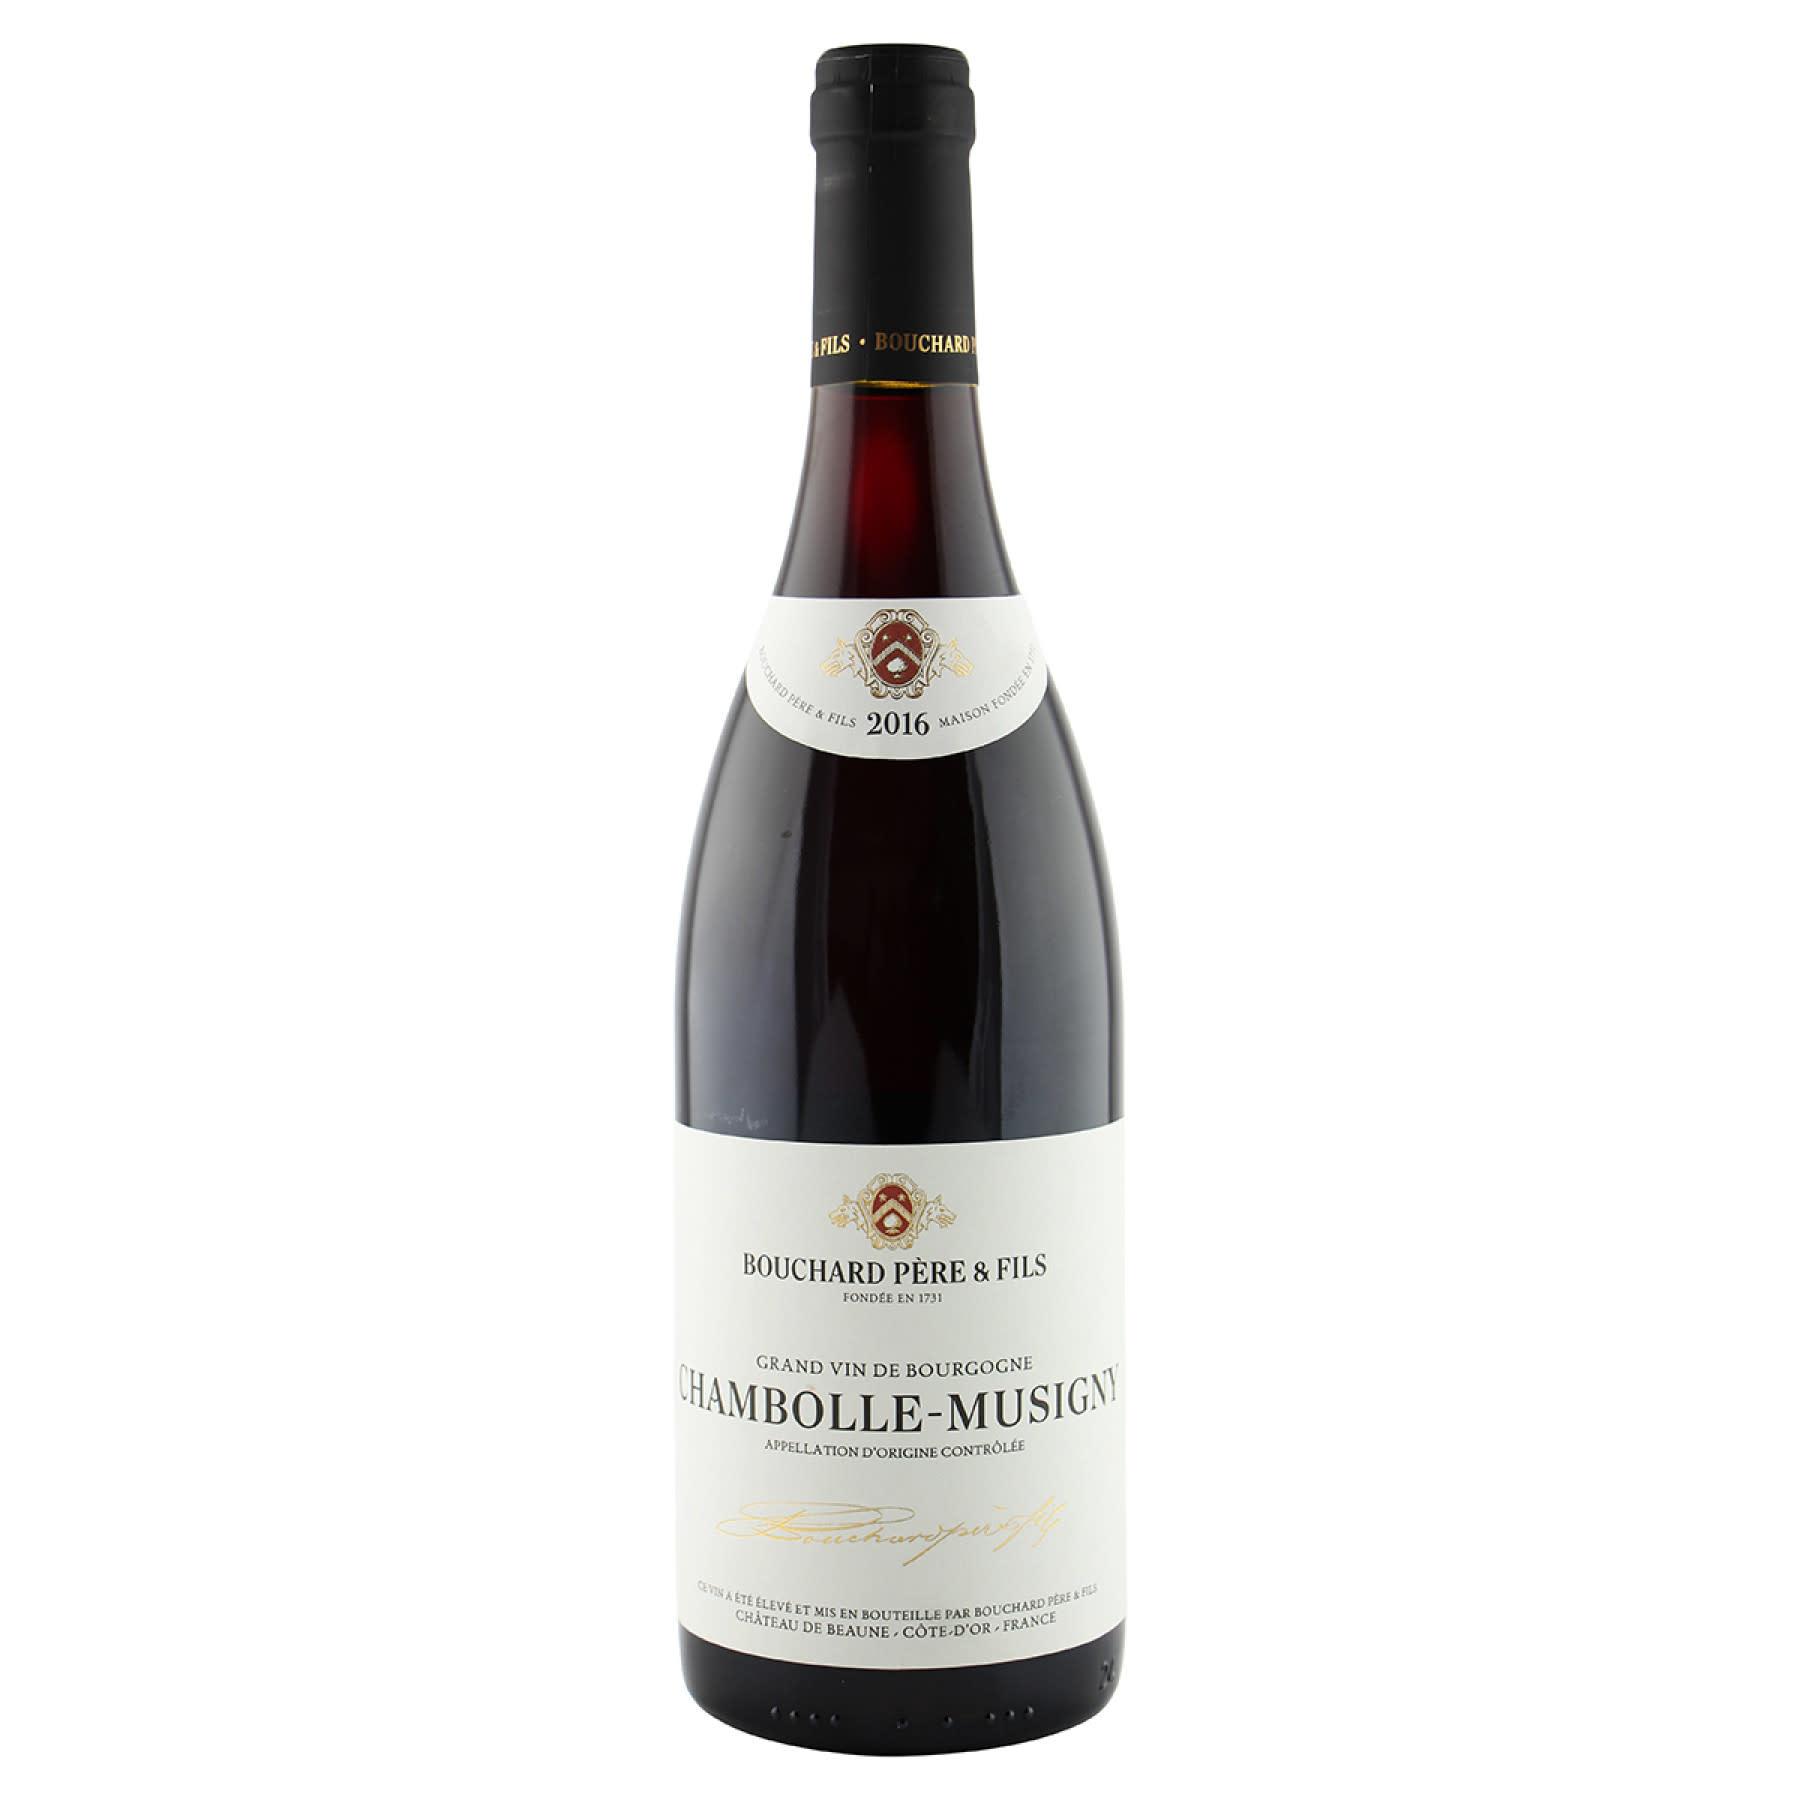 Bouchard Chambolle-Musigny 2017 - 750ml